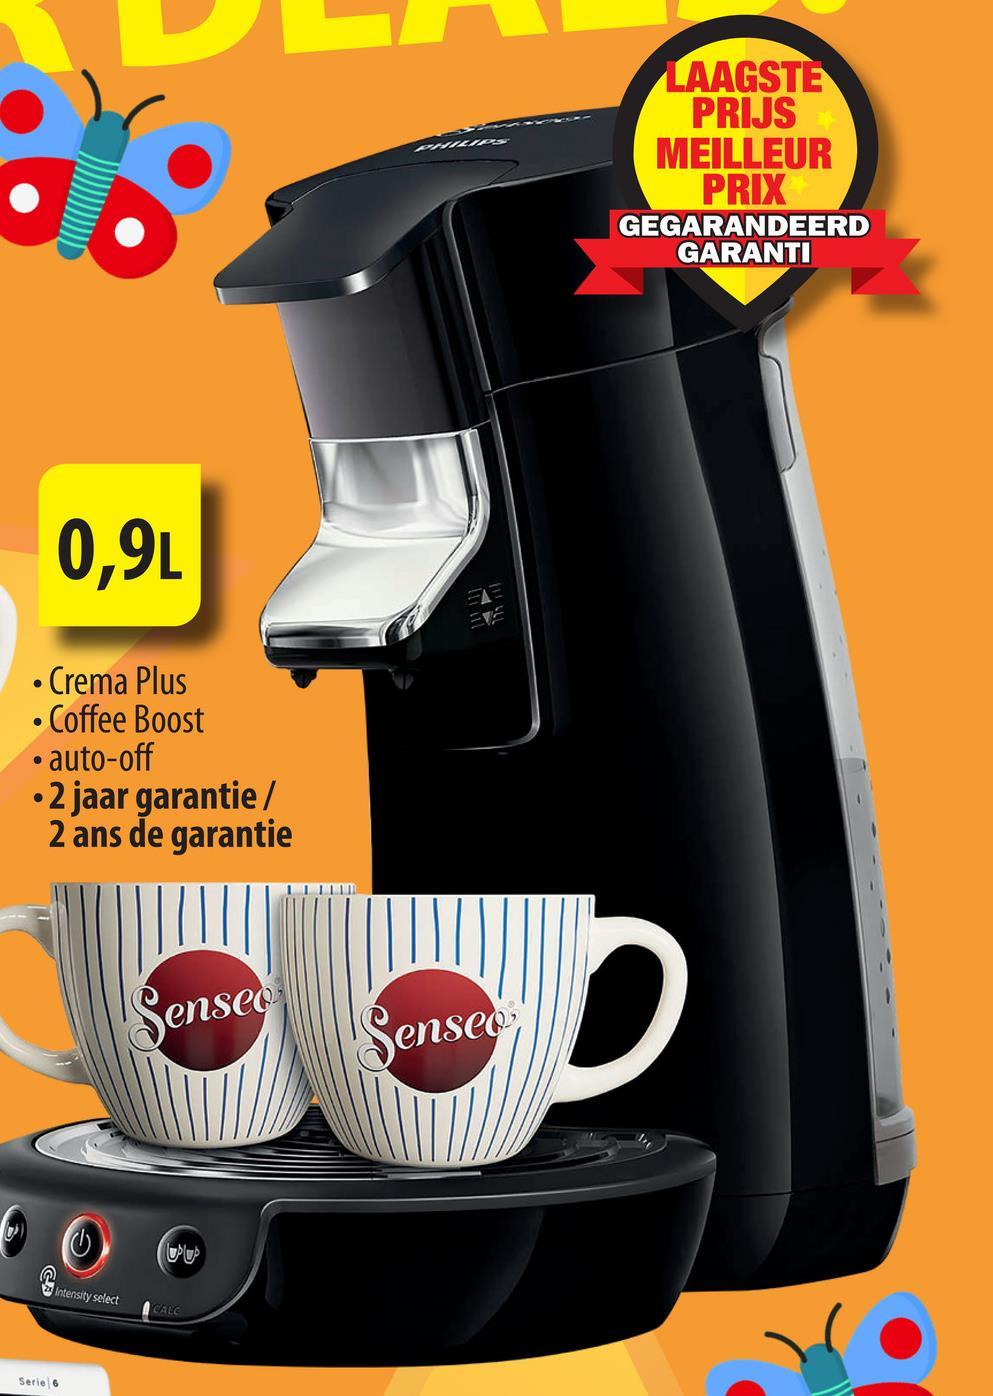 LAAGSTE PRIJS MEILLEUR PRIX GEGARANDEERD GARANTI 0,9L • Crema Plus • Coffee Boost • auto-off • 2 jaar garantie / 2 ans de garantie LIILL Senseo Senseo D Intensity select CALC . Serie 6